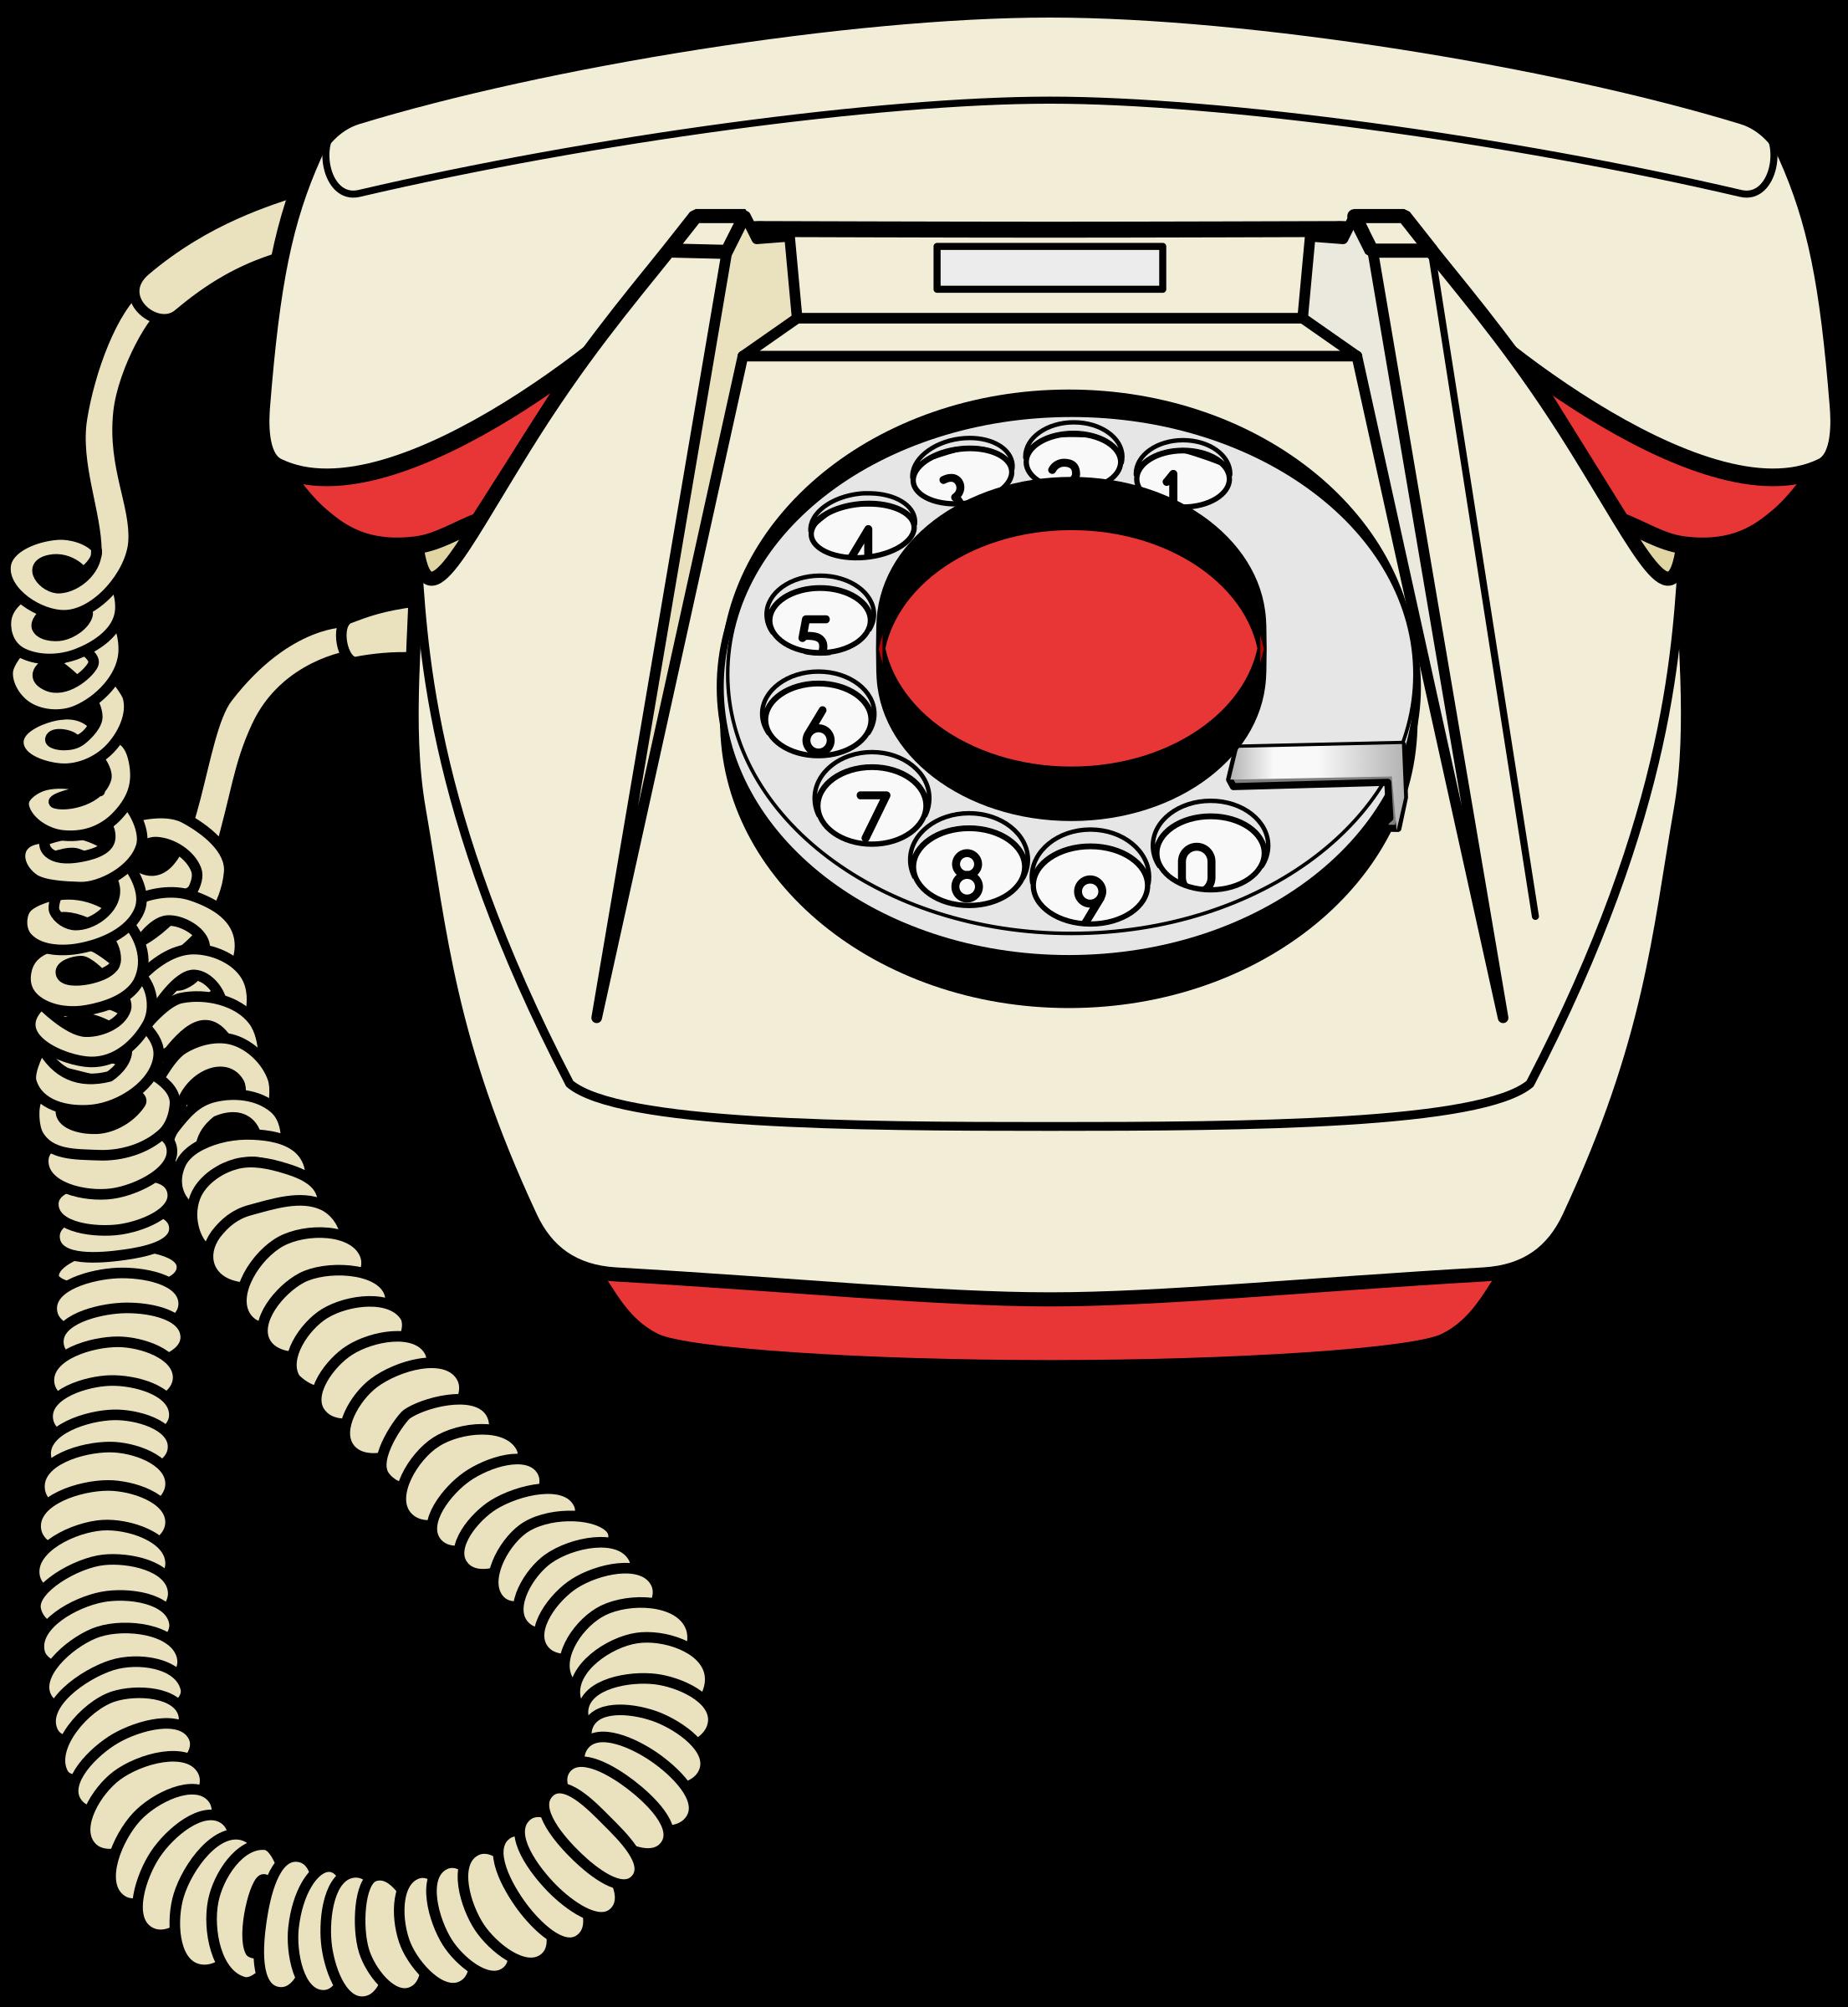 Telephone set bs big. Phone clipart rotary phone